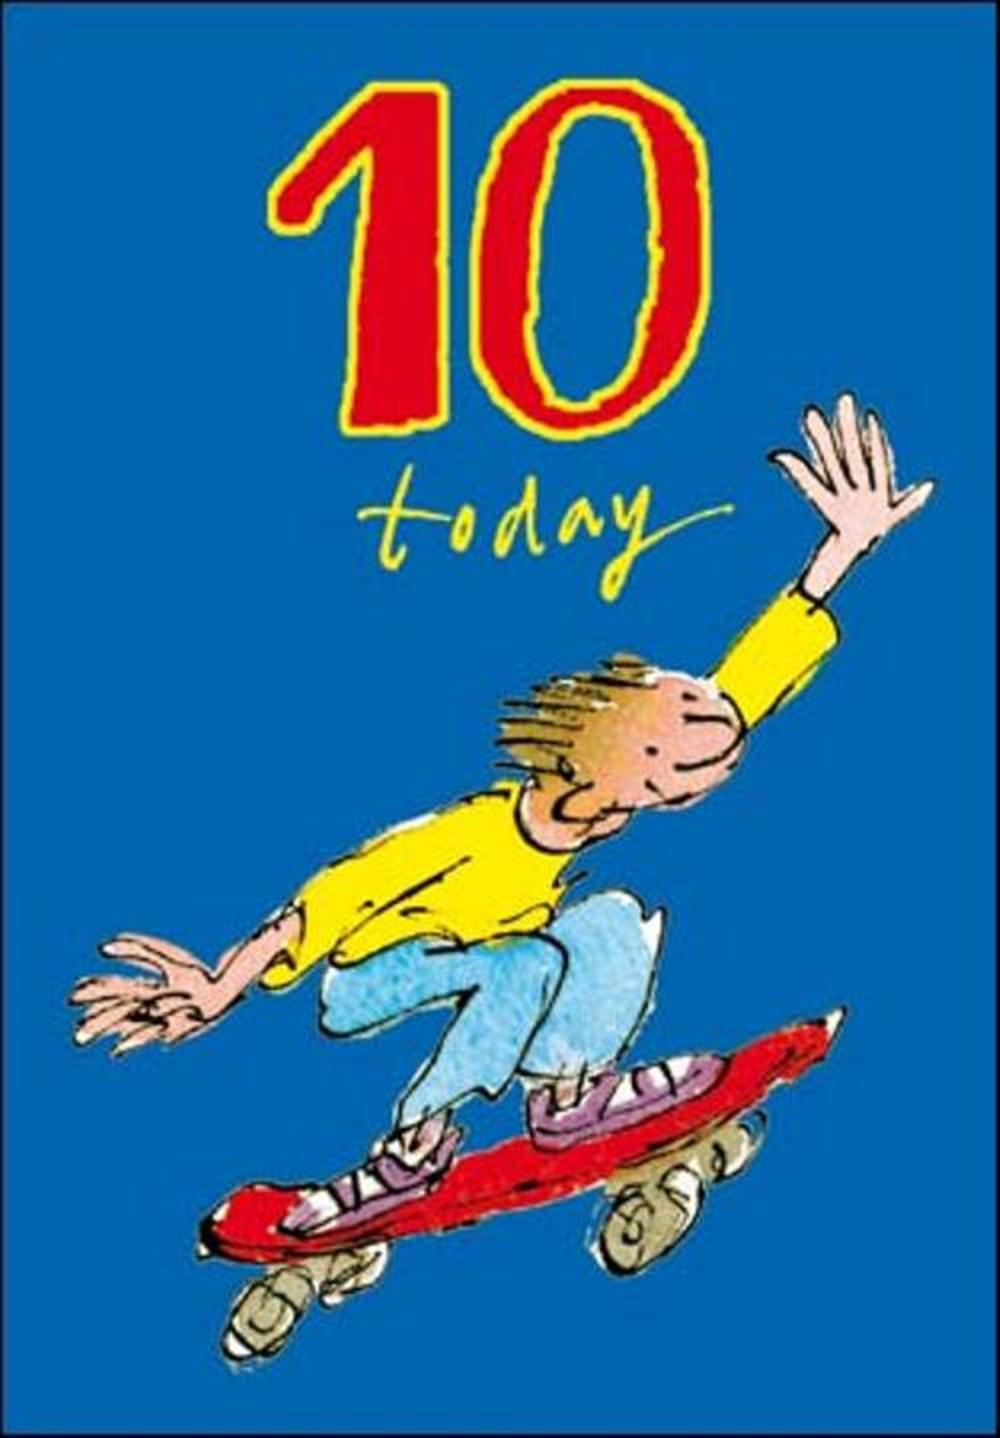 Quentin Blake Boys 10th Birthday Greeting Card